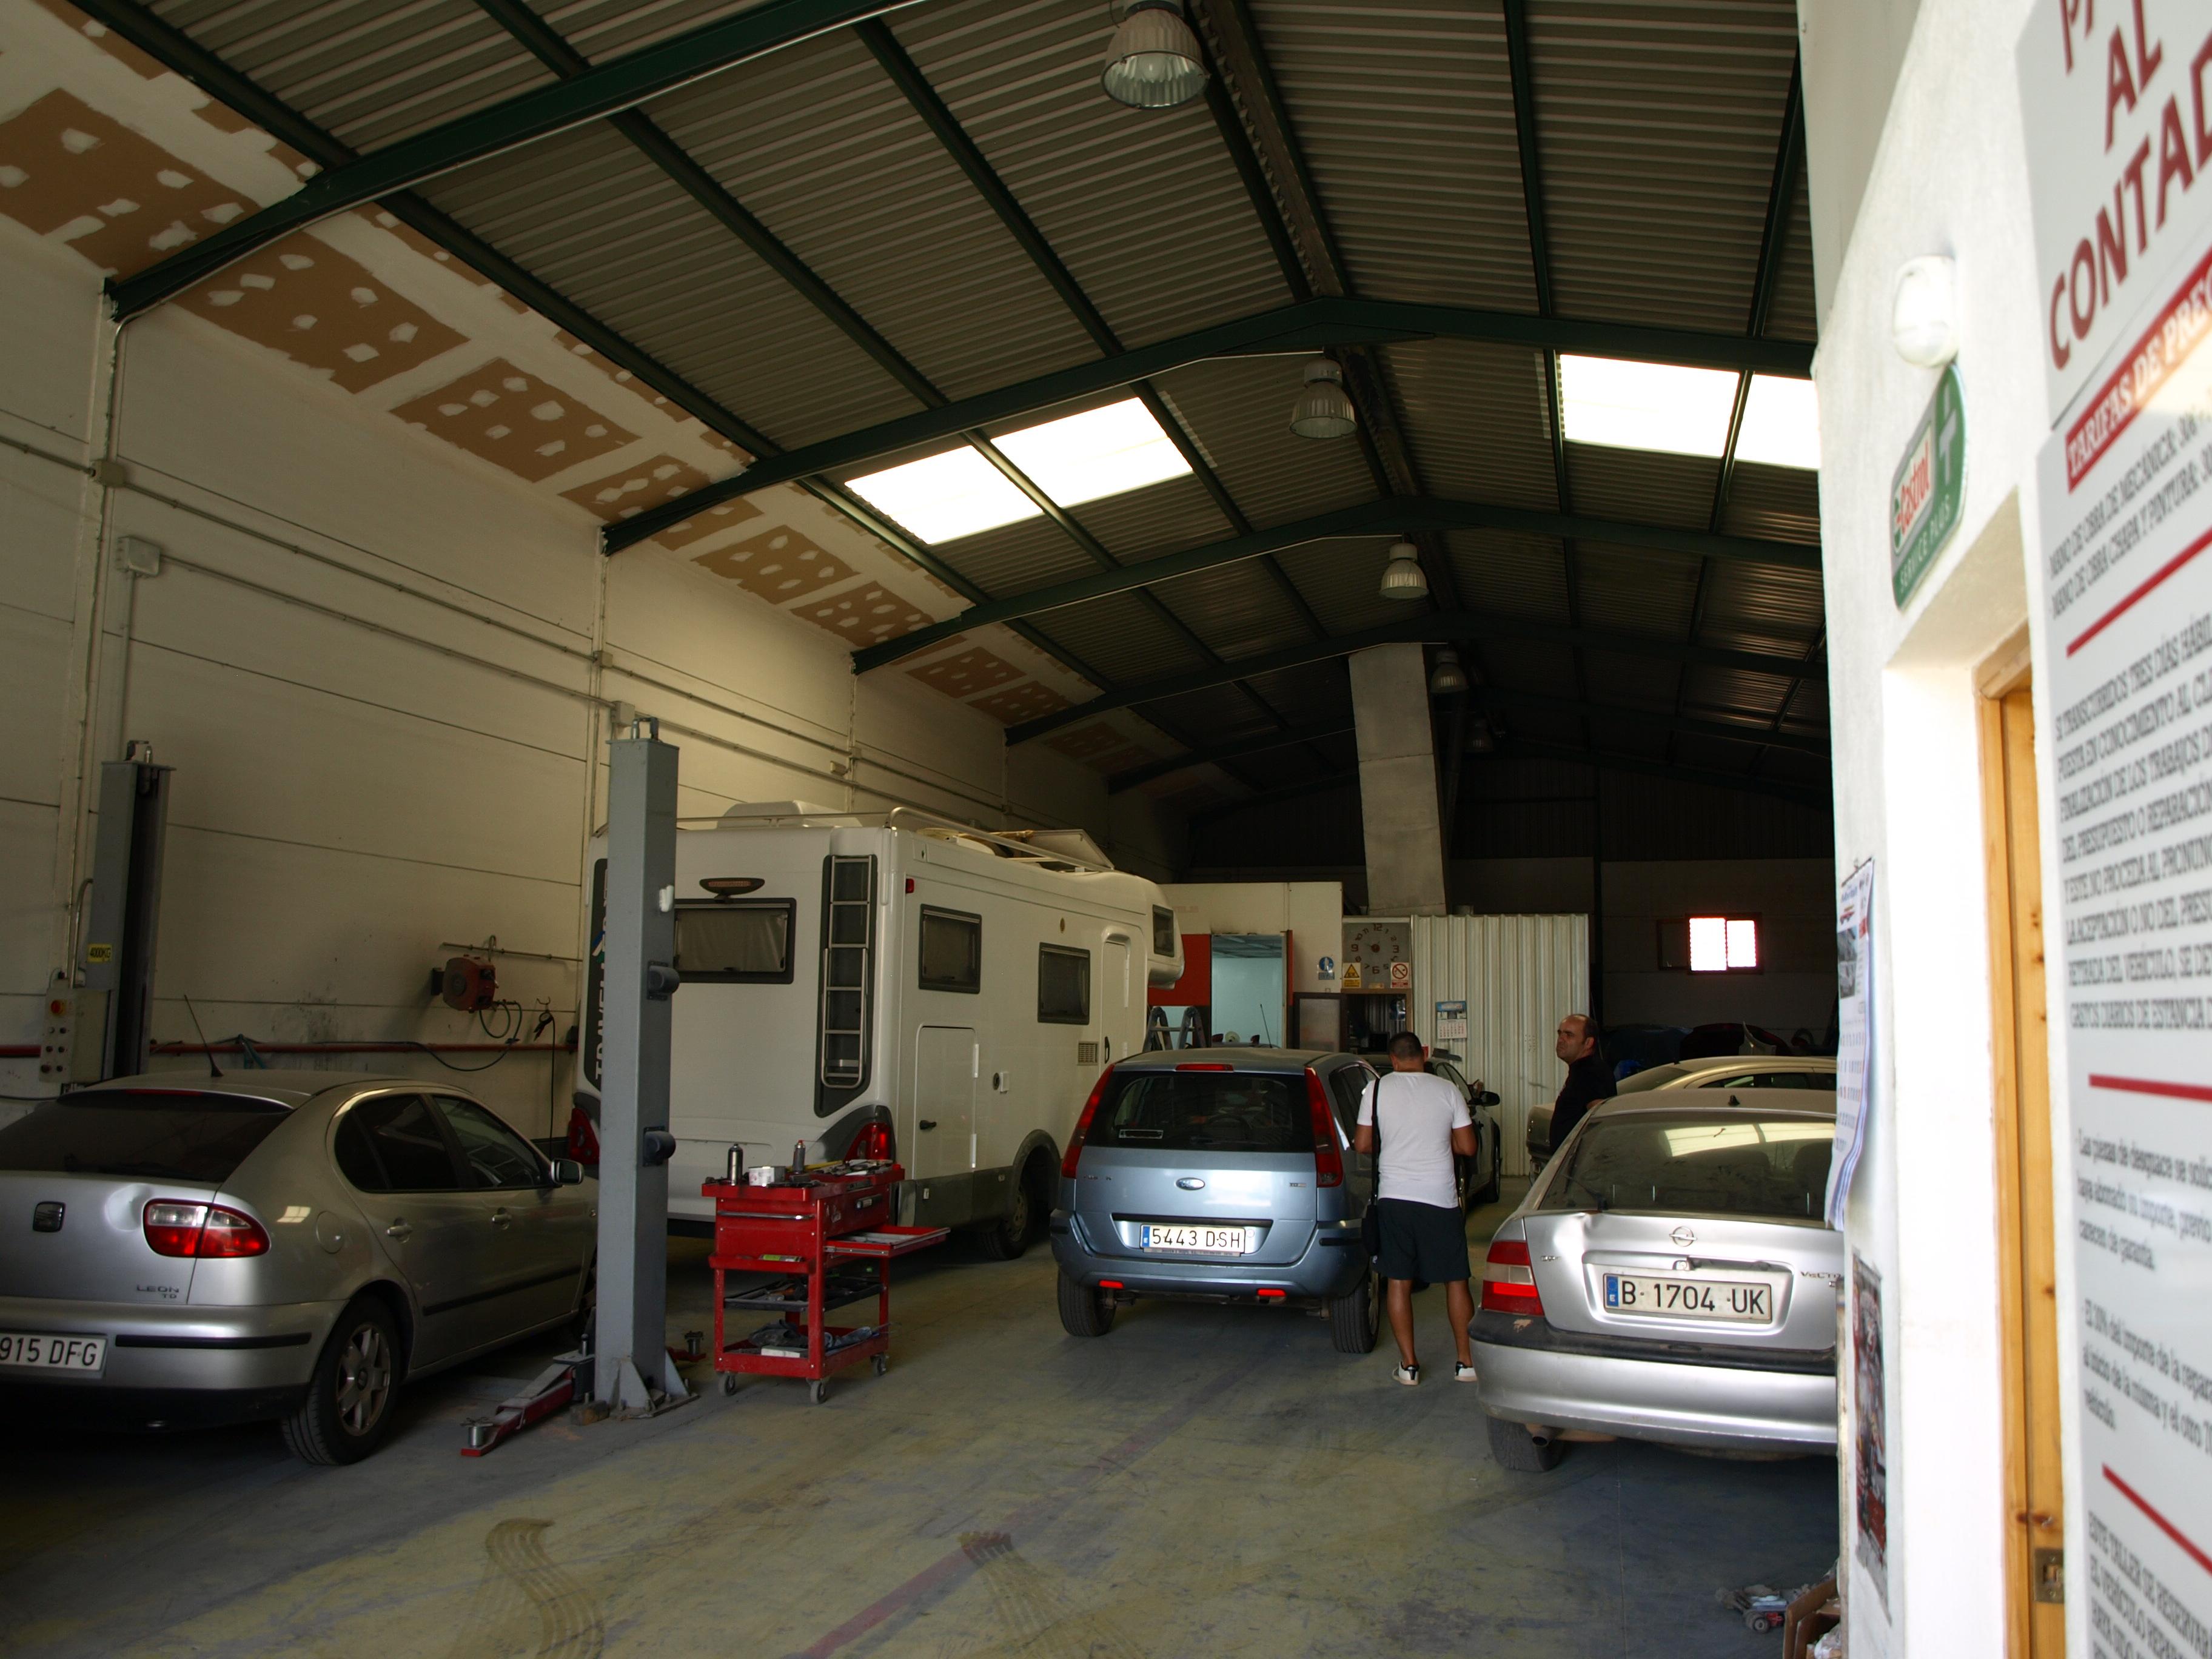 españa taller de chapa y pintura , mecánica general en zafra - padilla